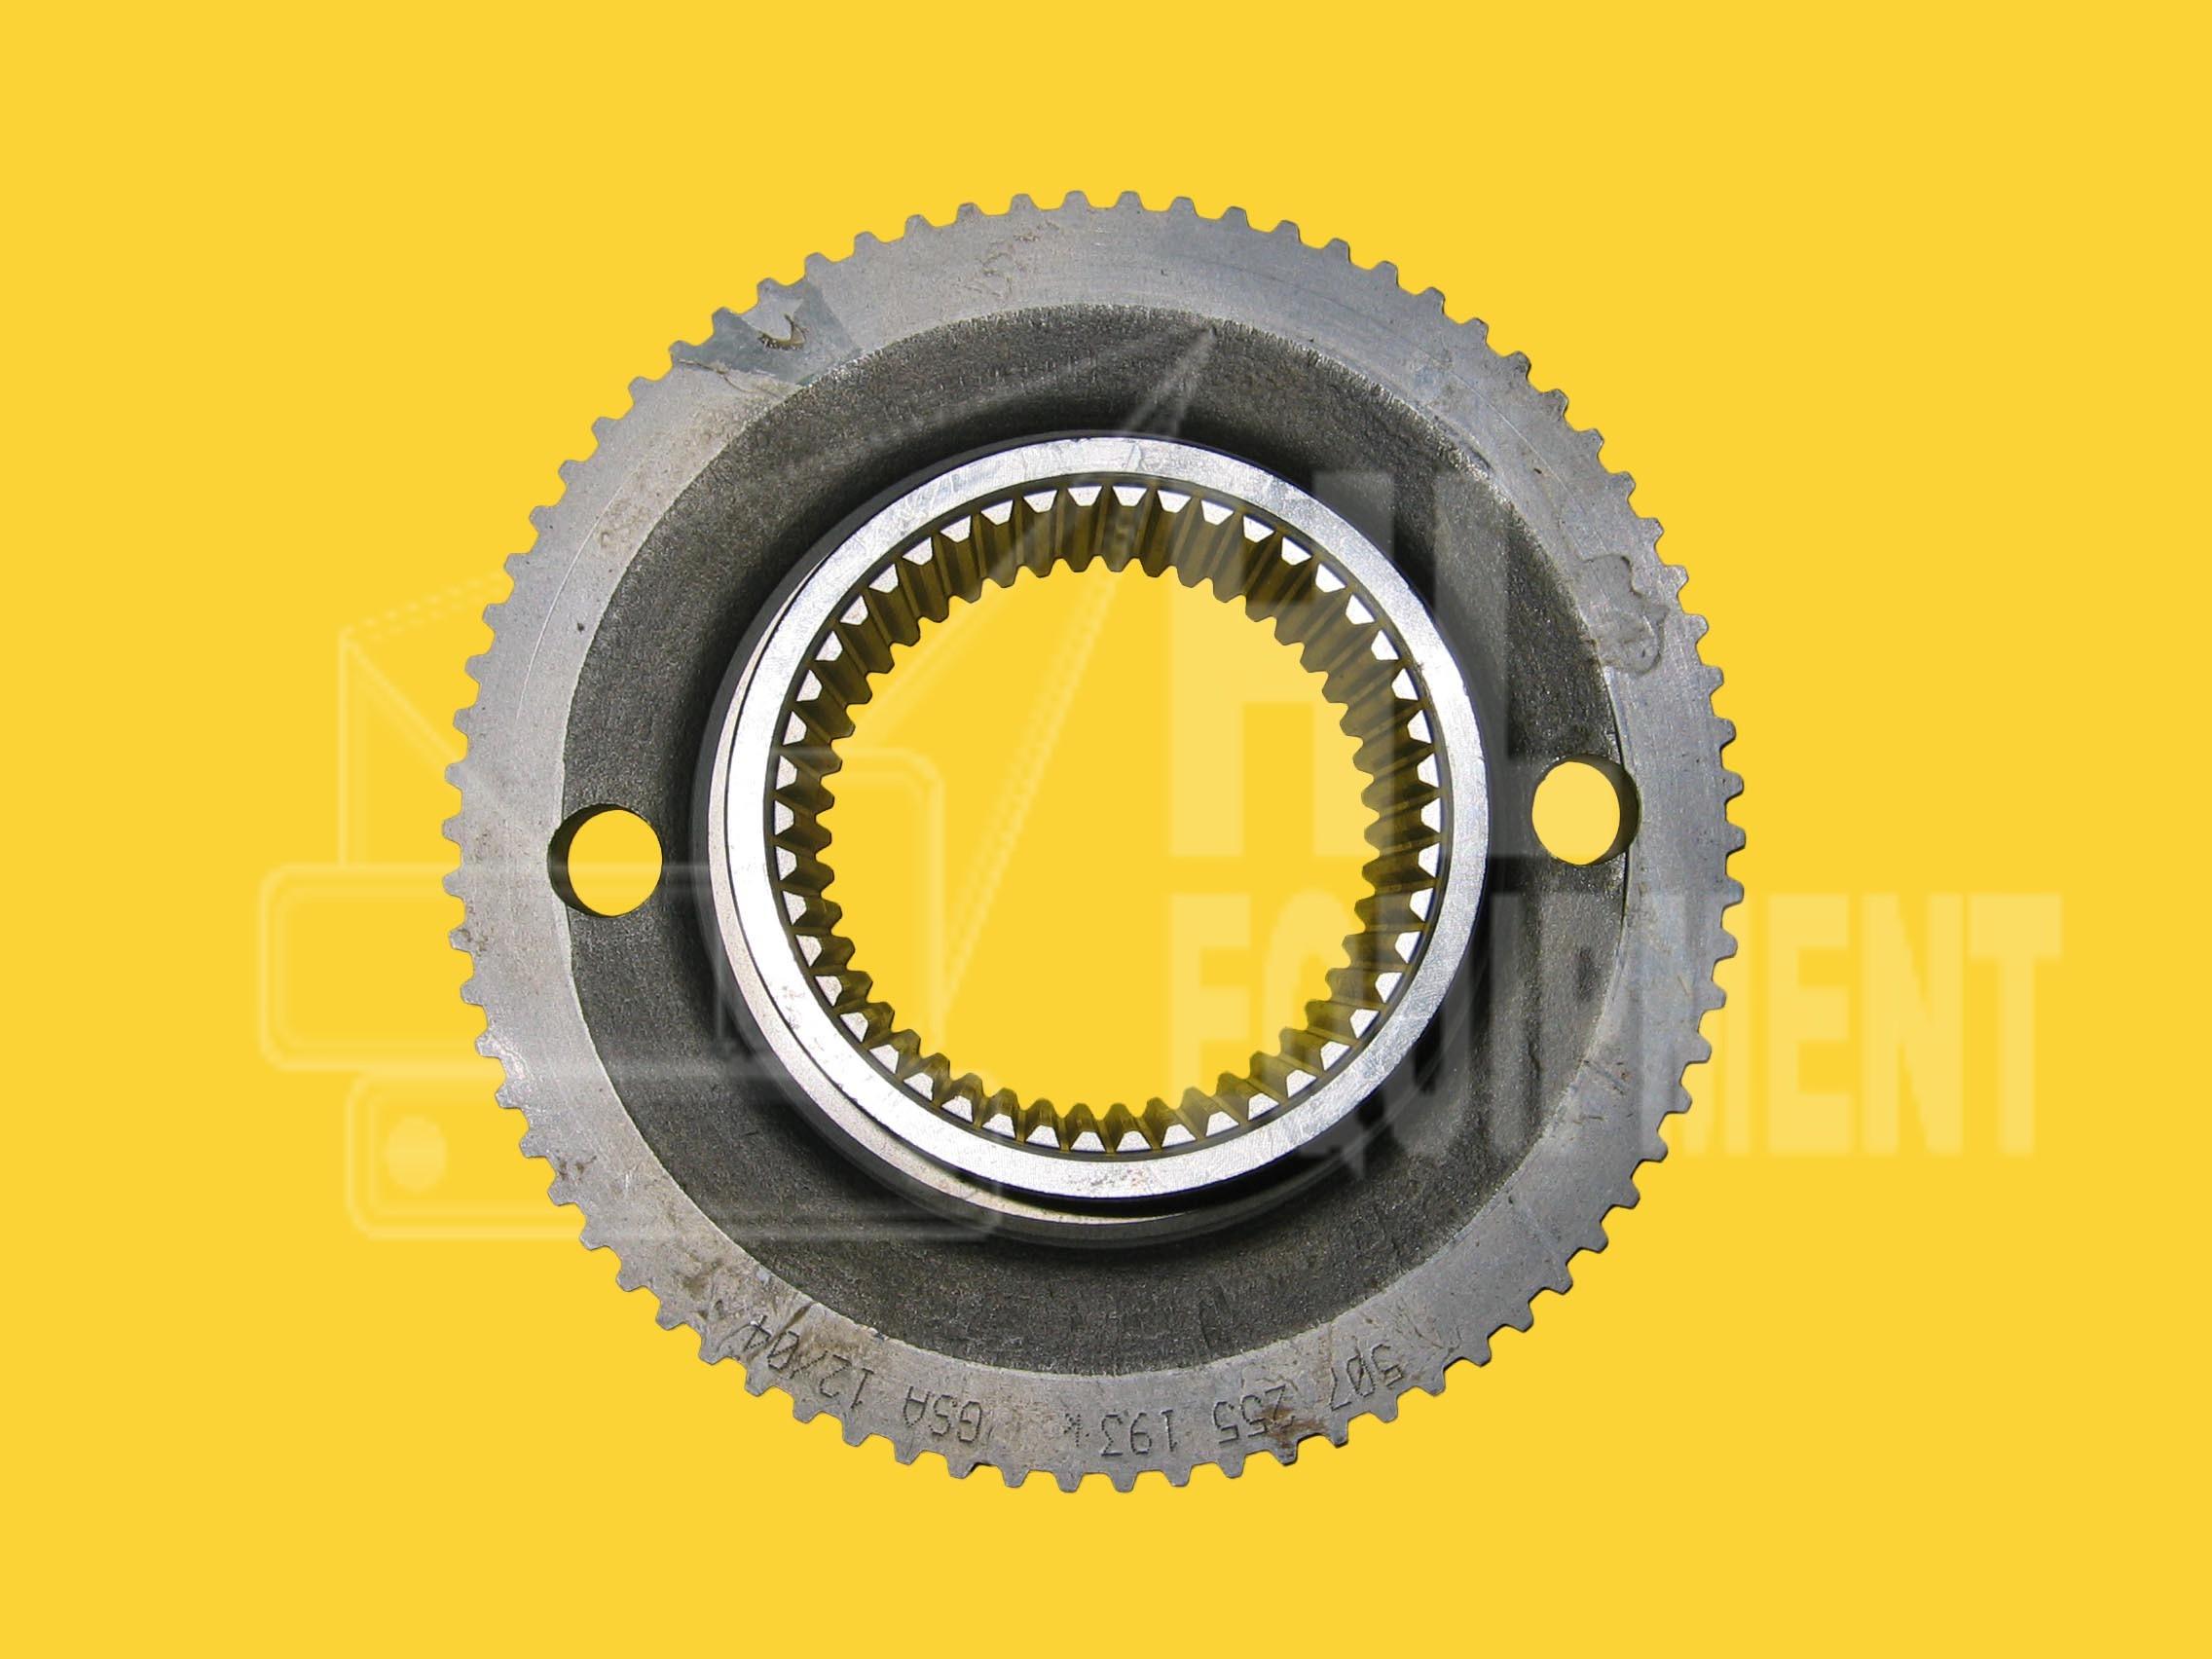 Tadano Ring Gear